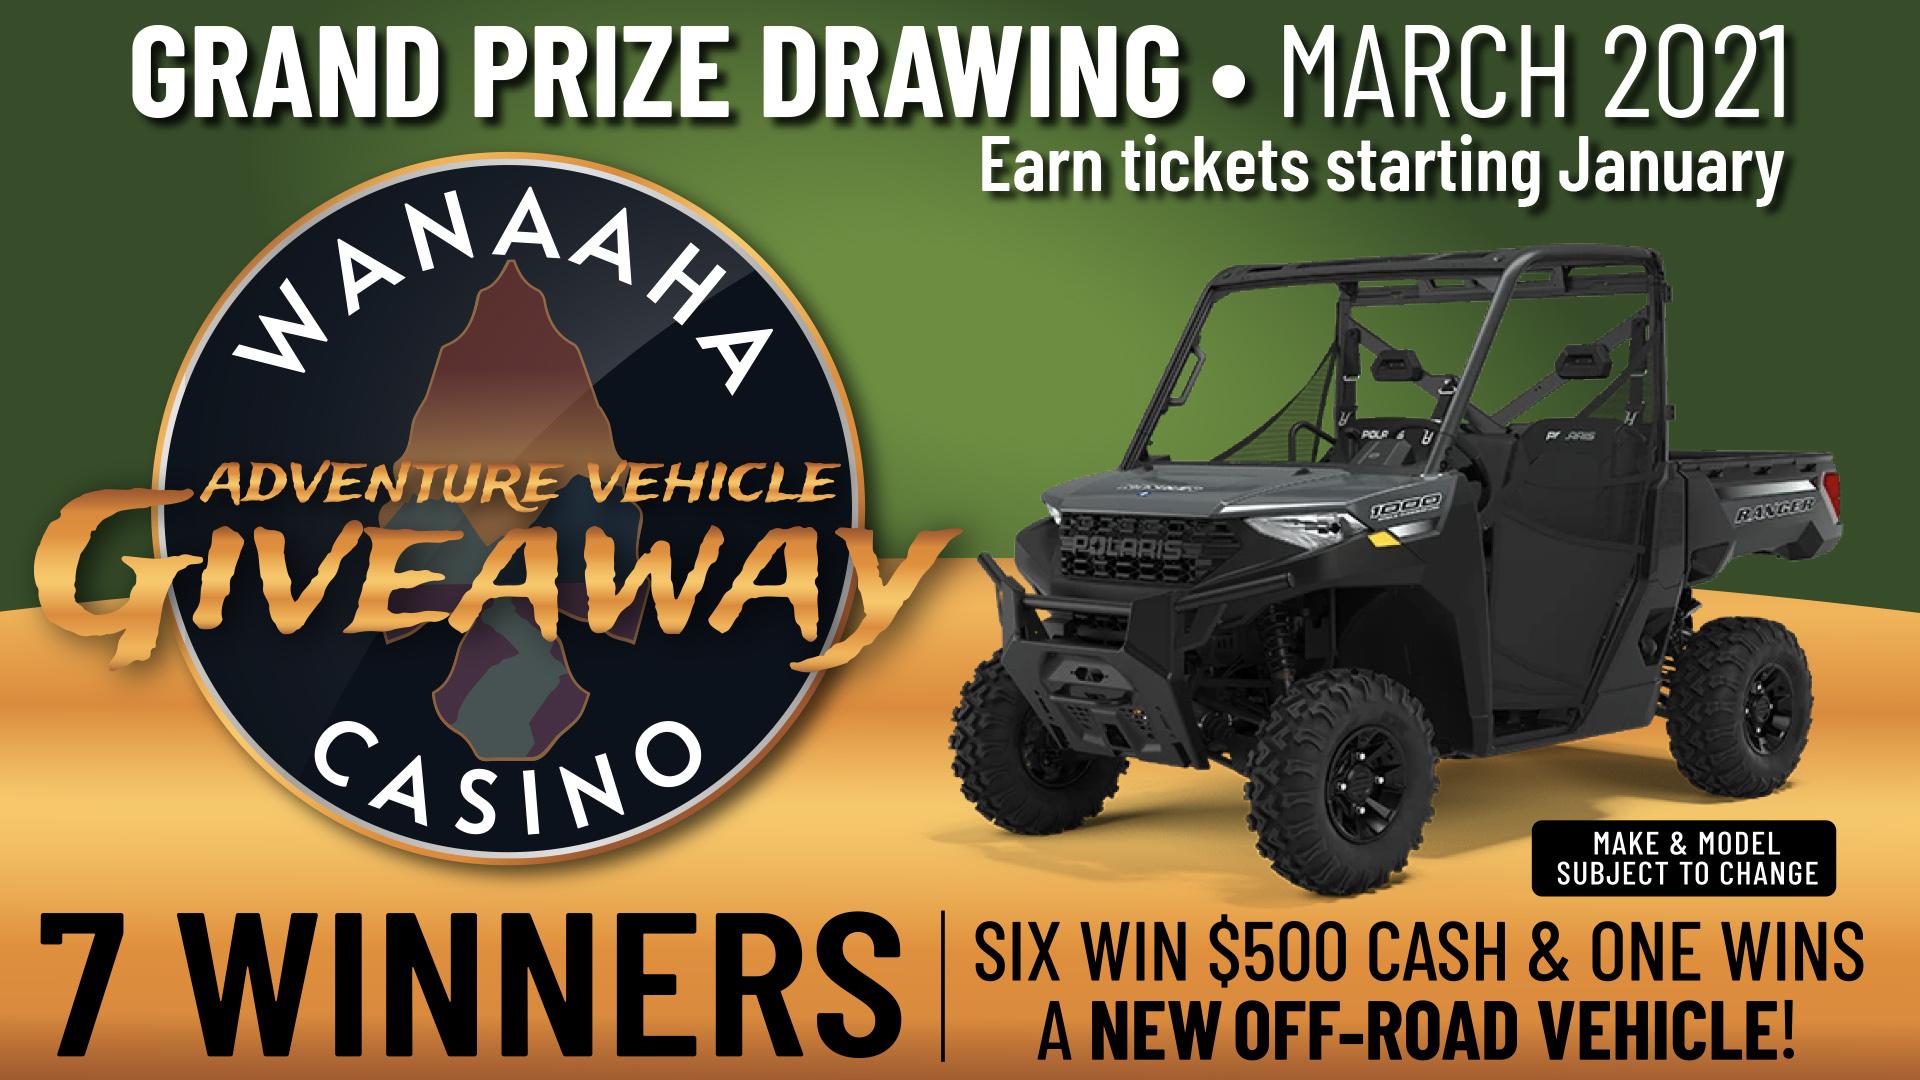 adventure vehicle giveaway - wanaaha casino promotion